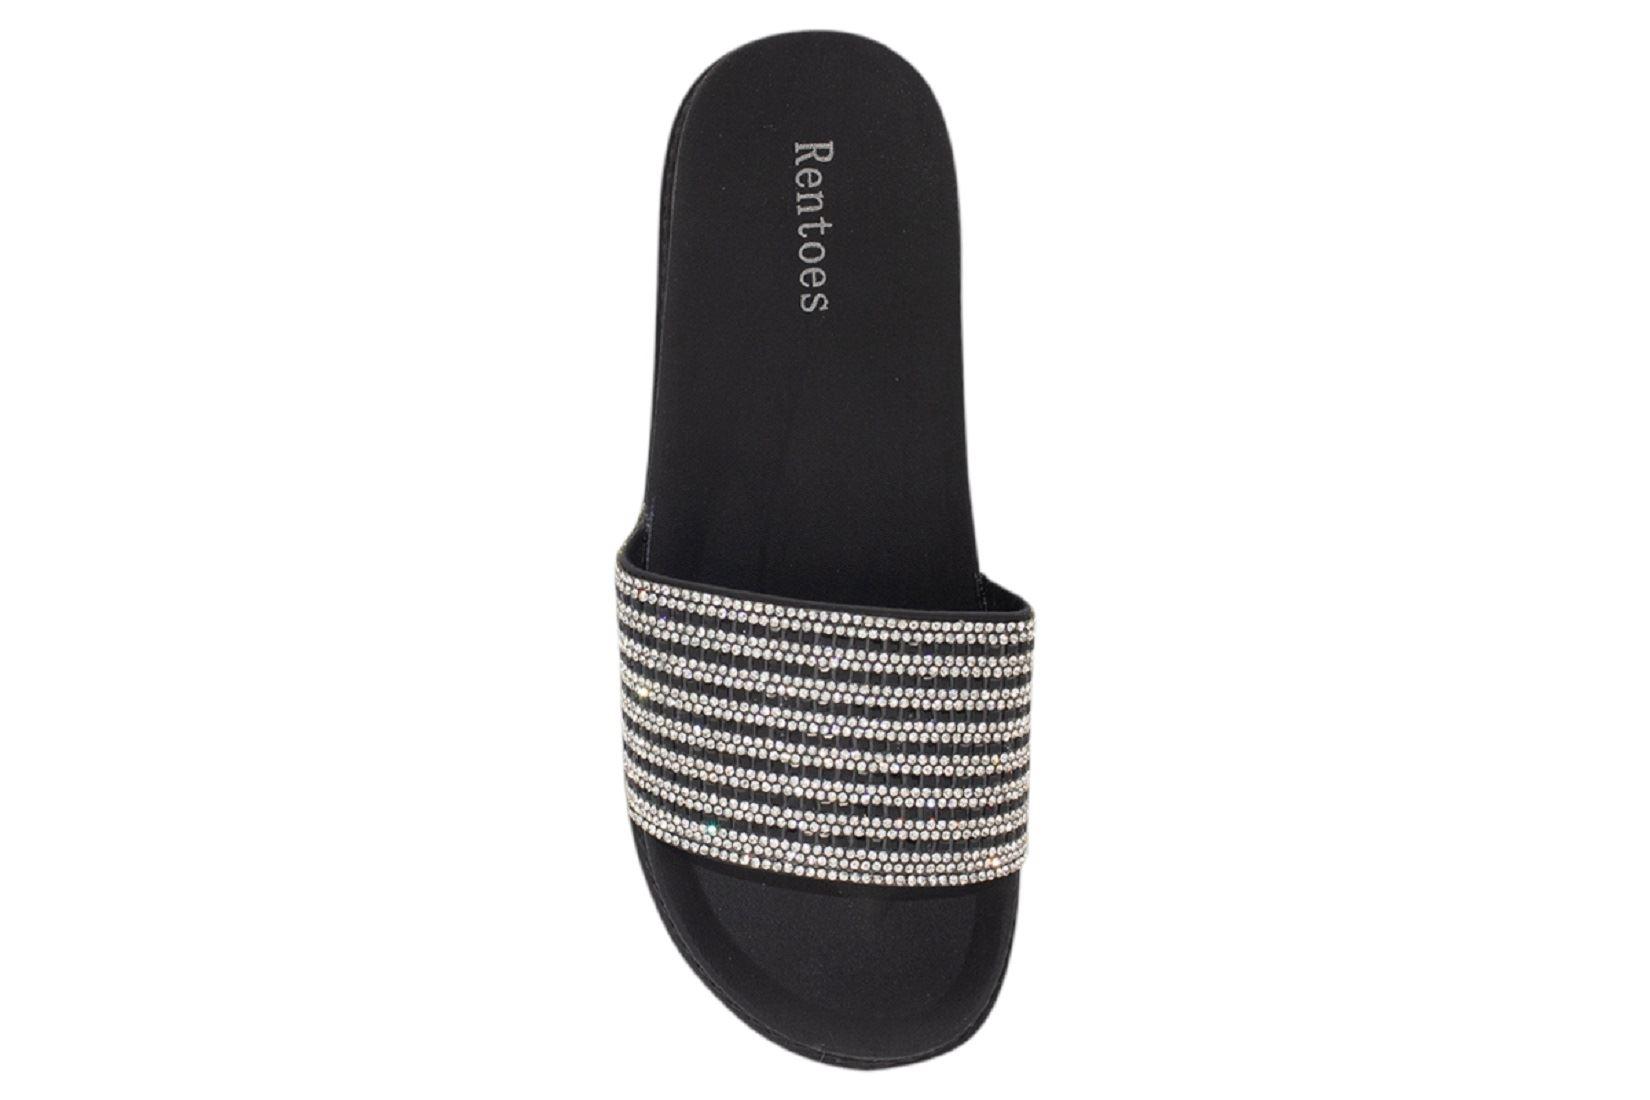 Womens-Sliders-Casual-Slippers-Mules-Ladies-Diamante-Flip-Flop-Sandals-Shoes thumbnail 34